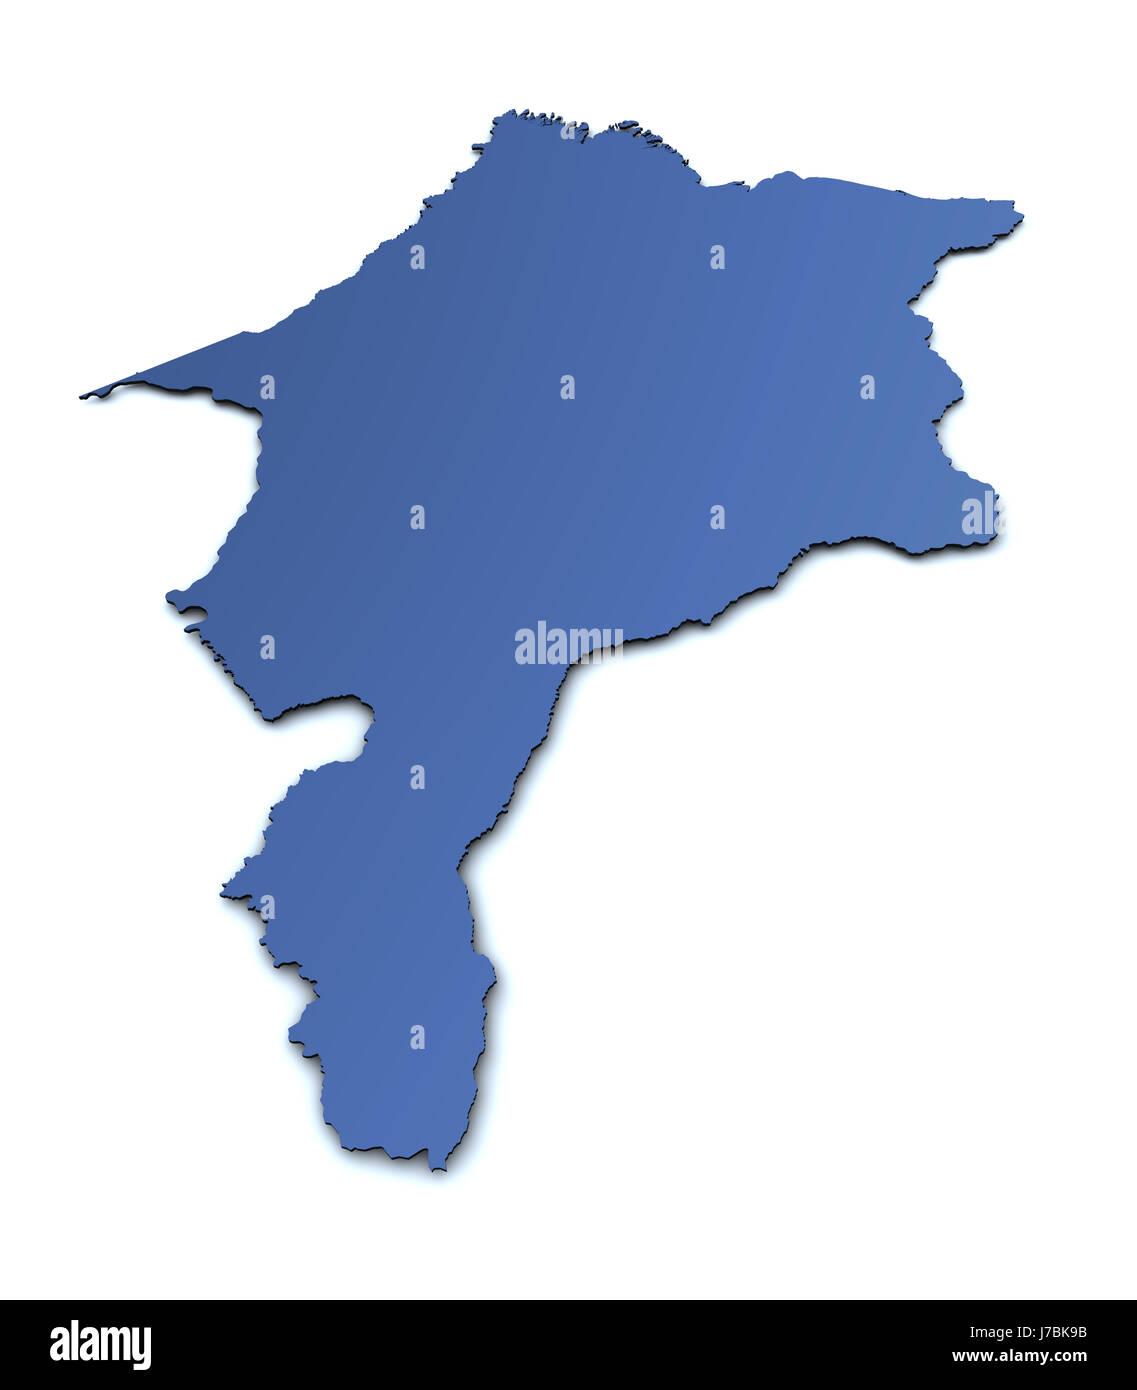 america brazil south america card atlas map of the world map illustration